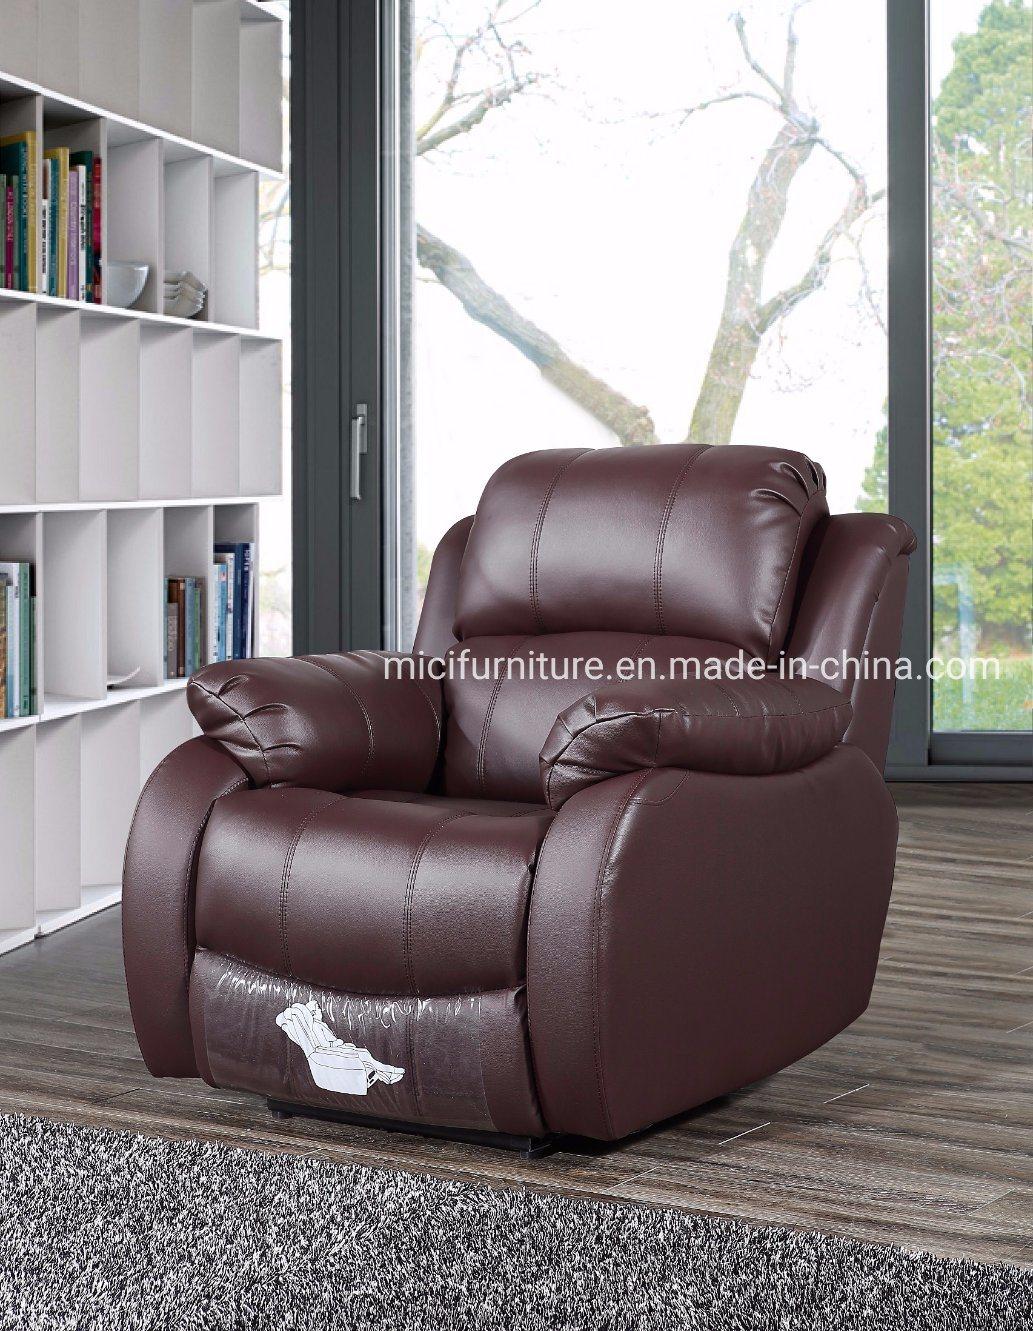 - China Home Furniture Cinema Single Genuine Leather Recliner Sofa